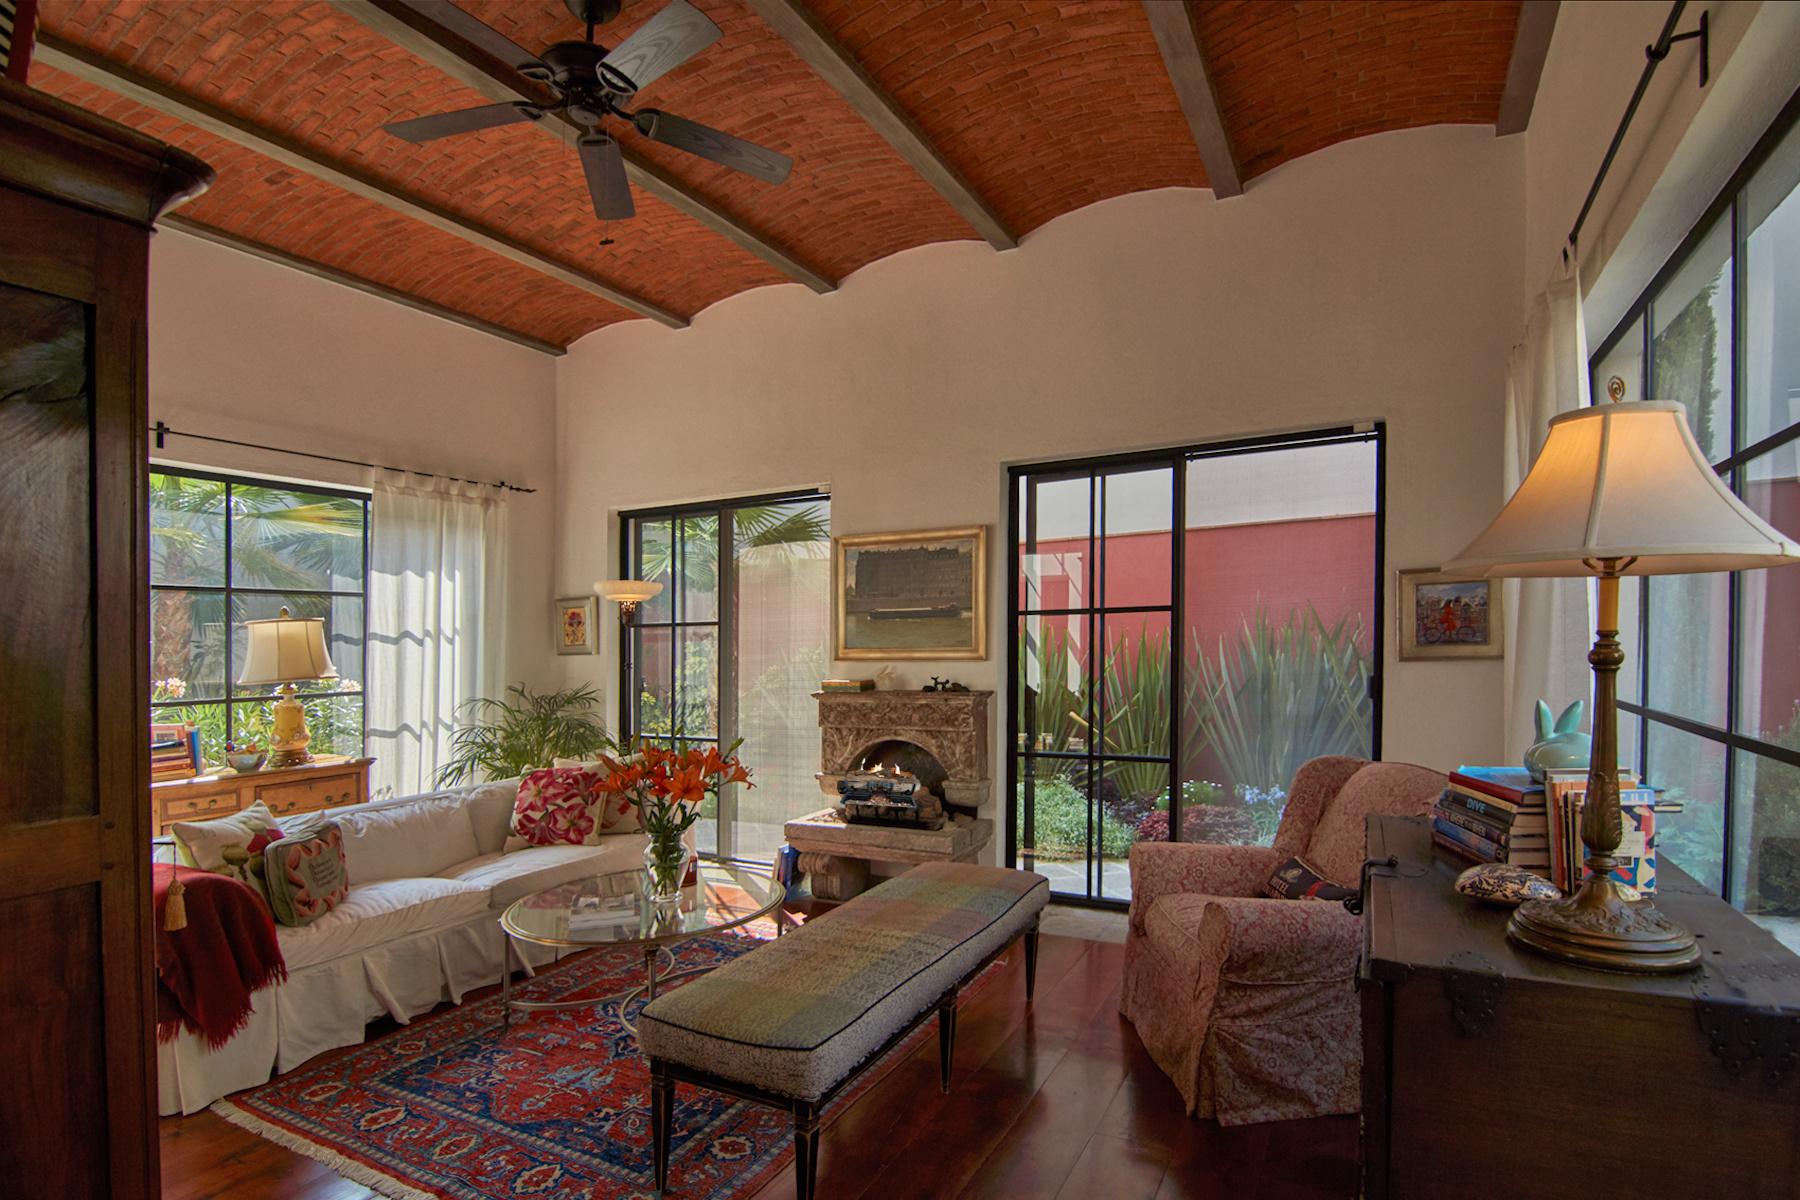 Additional photo for property listing at Casa Lilly Ojo De Agua, San Miguel De Allende, Guanajuato México